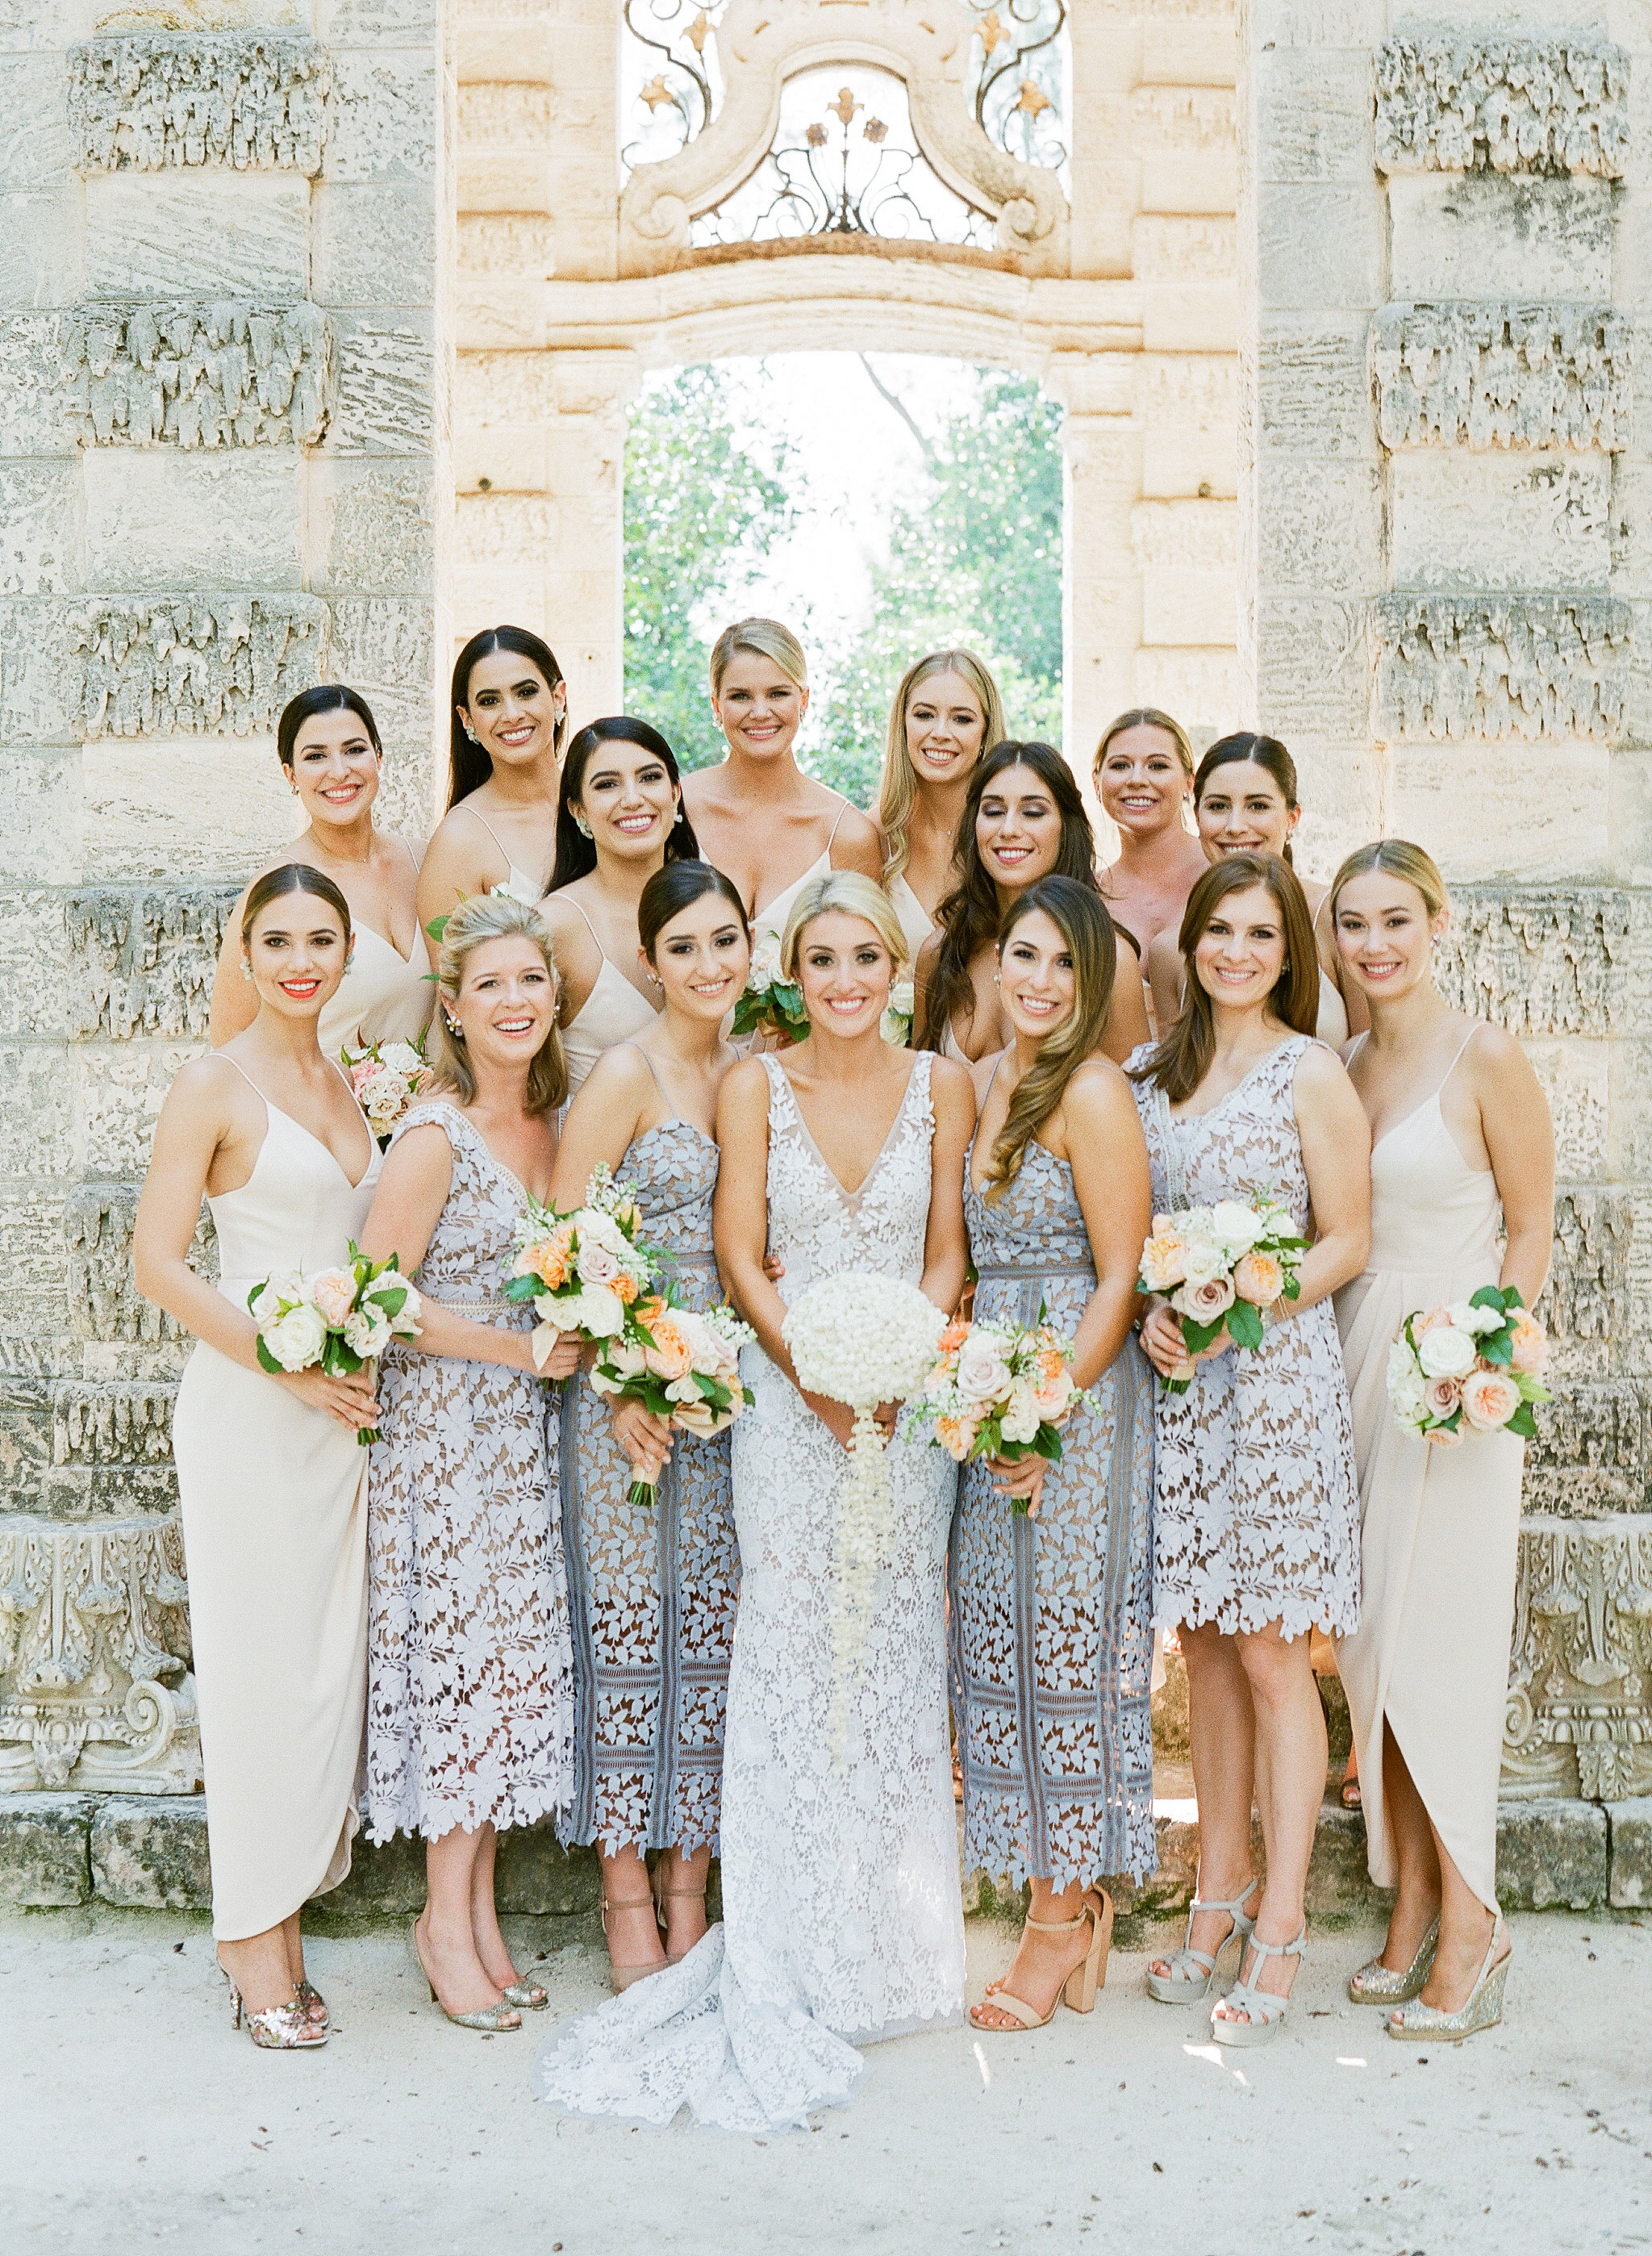 natalie jamey wedding bridesmaids